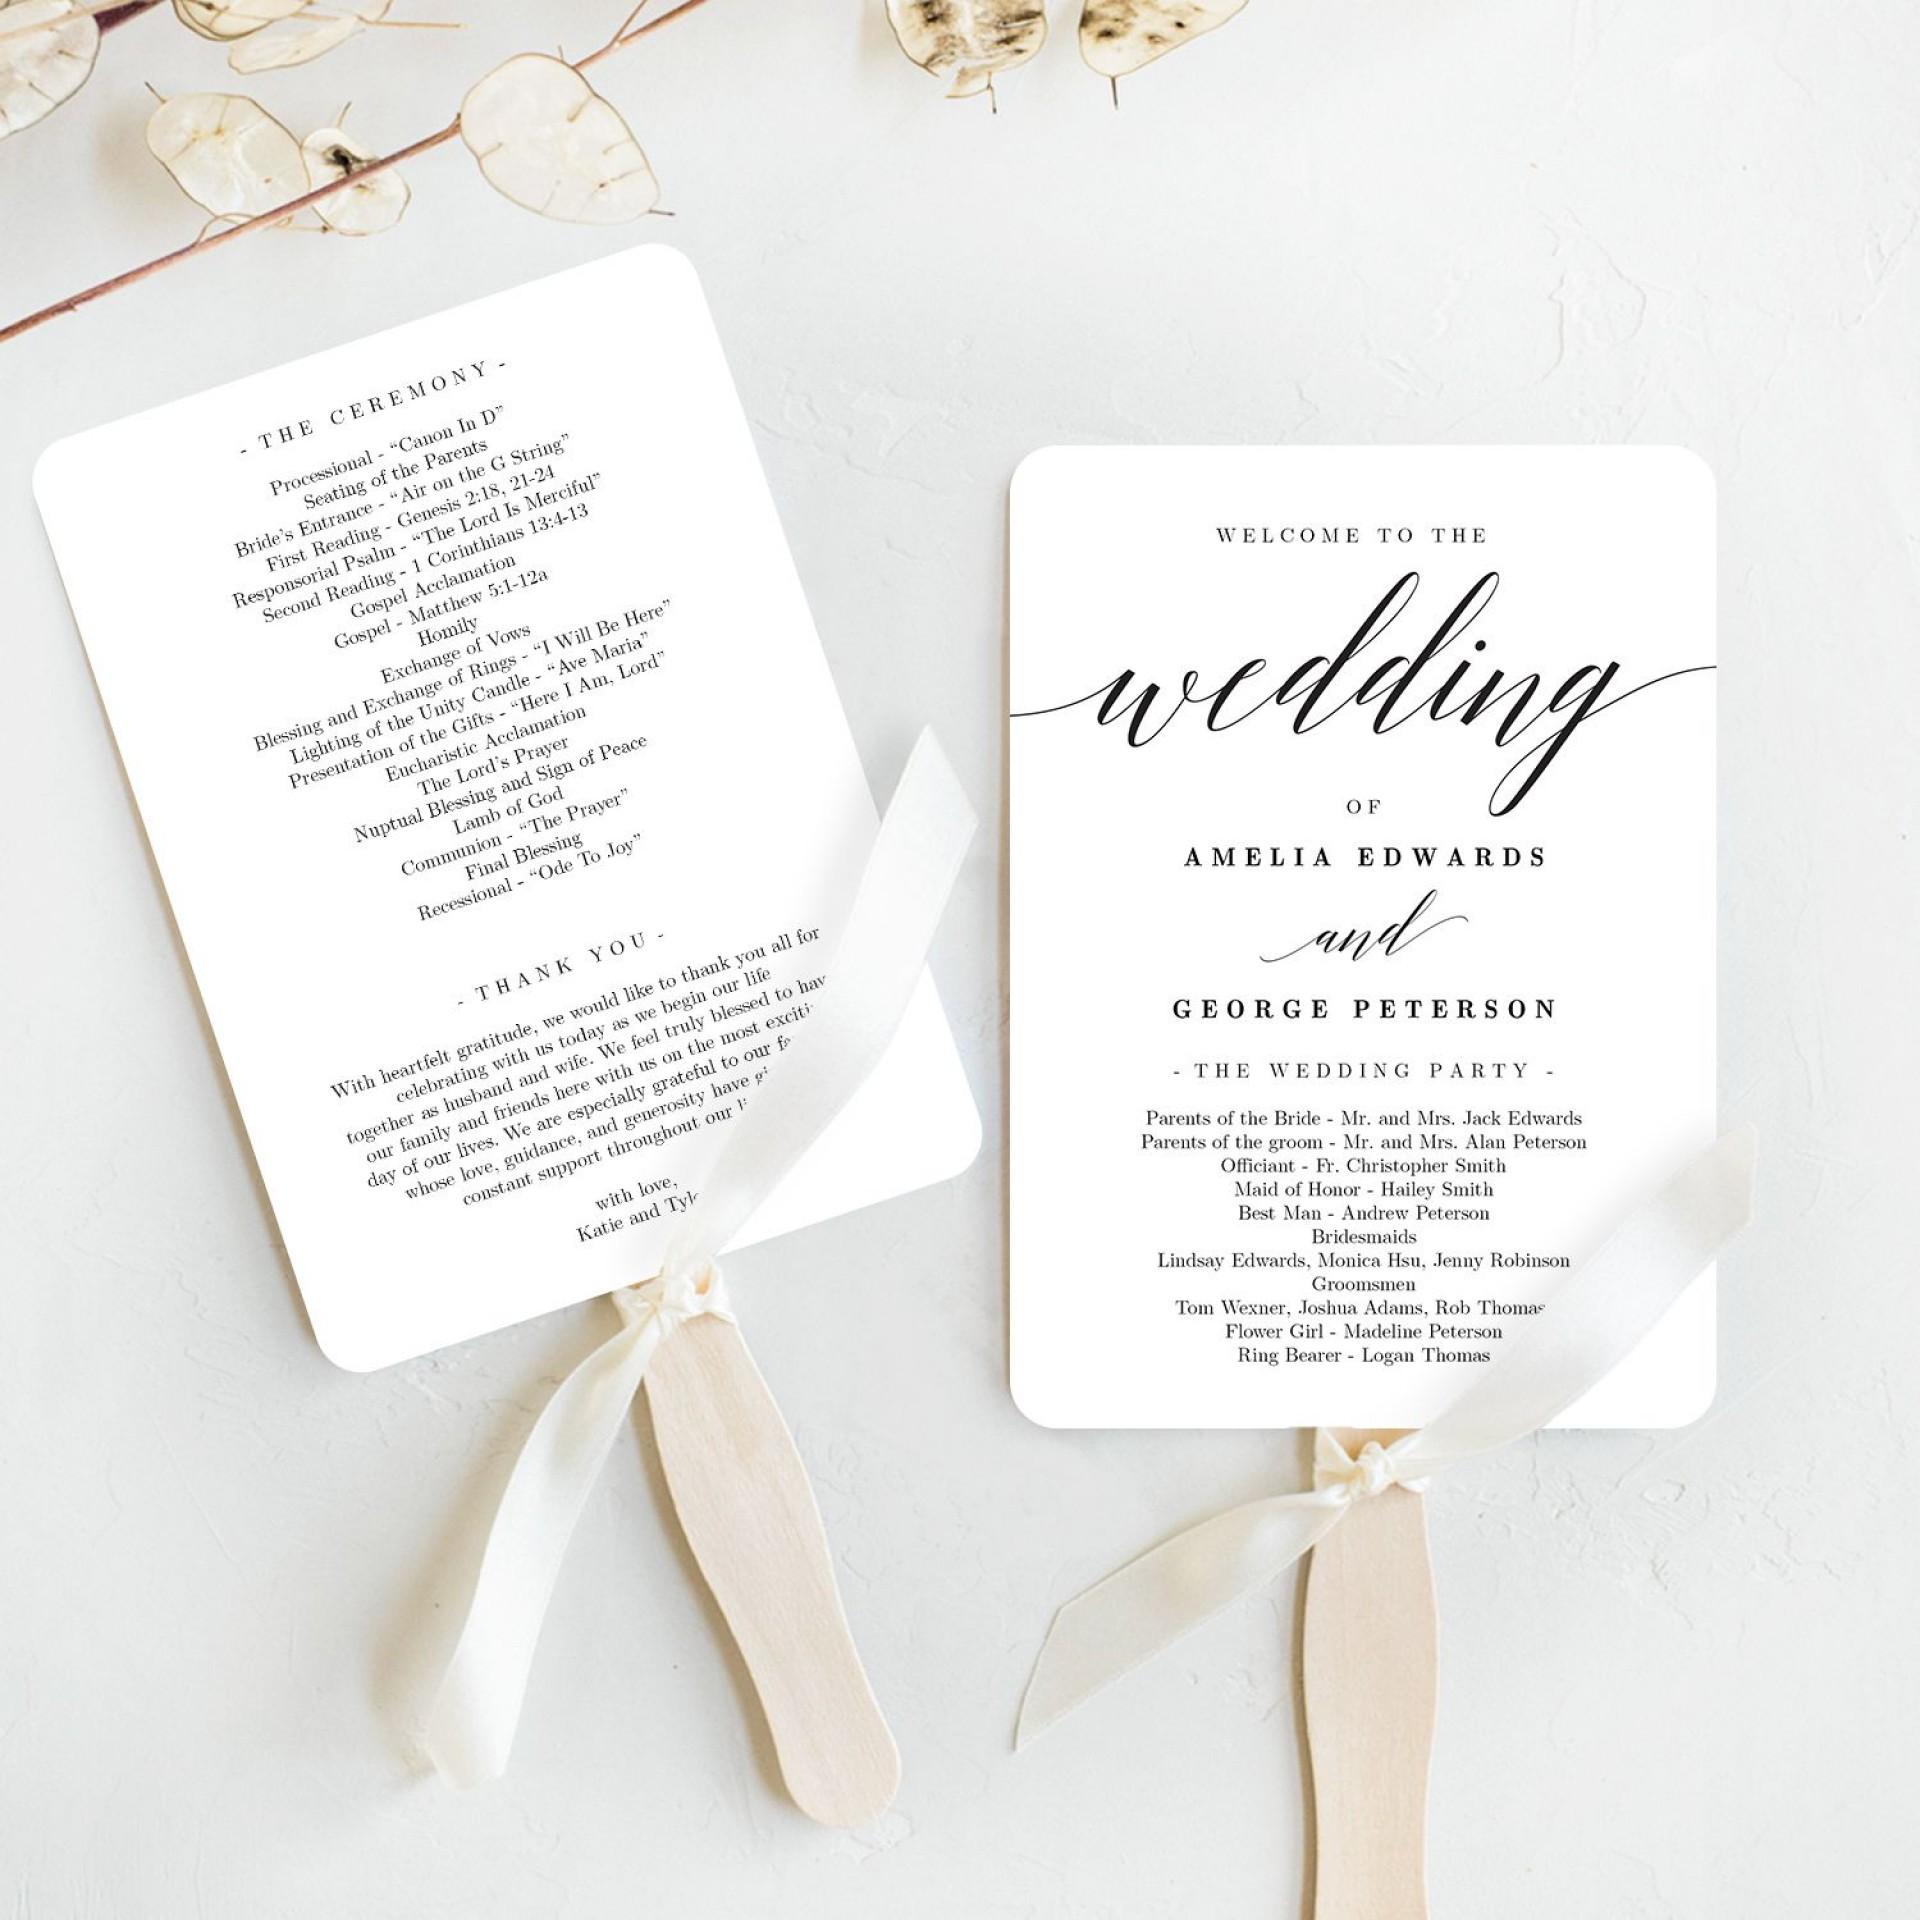 007 Imposing Free Download Template For Wedding Program Design  Programs1920